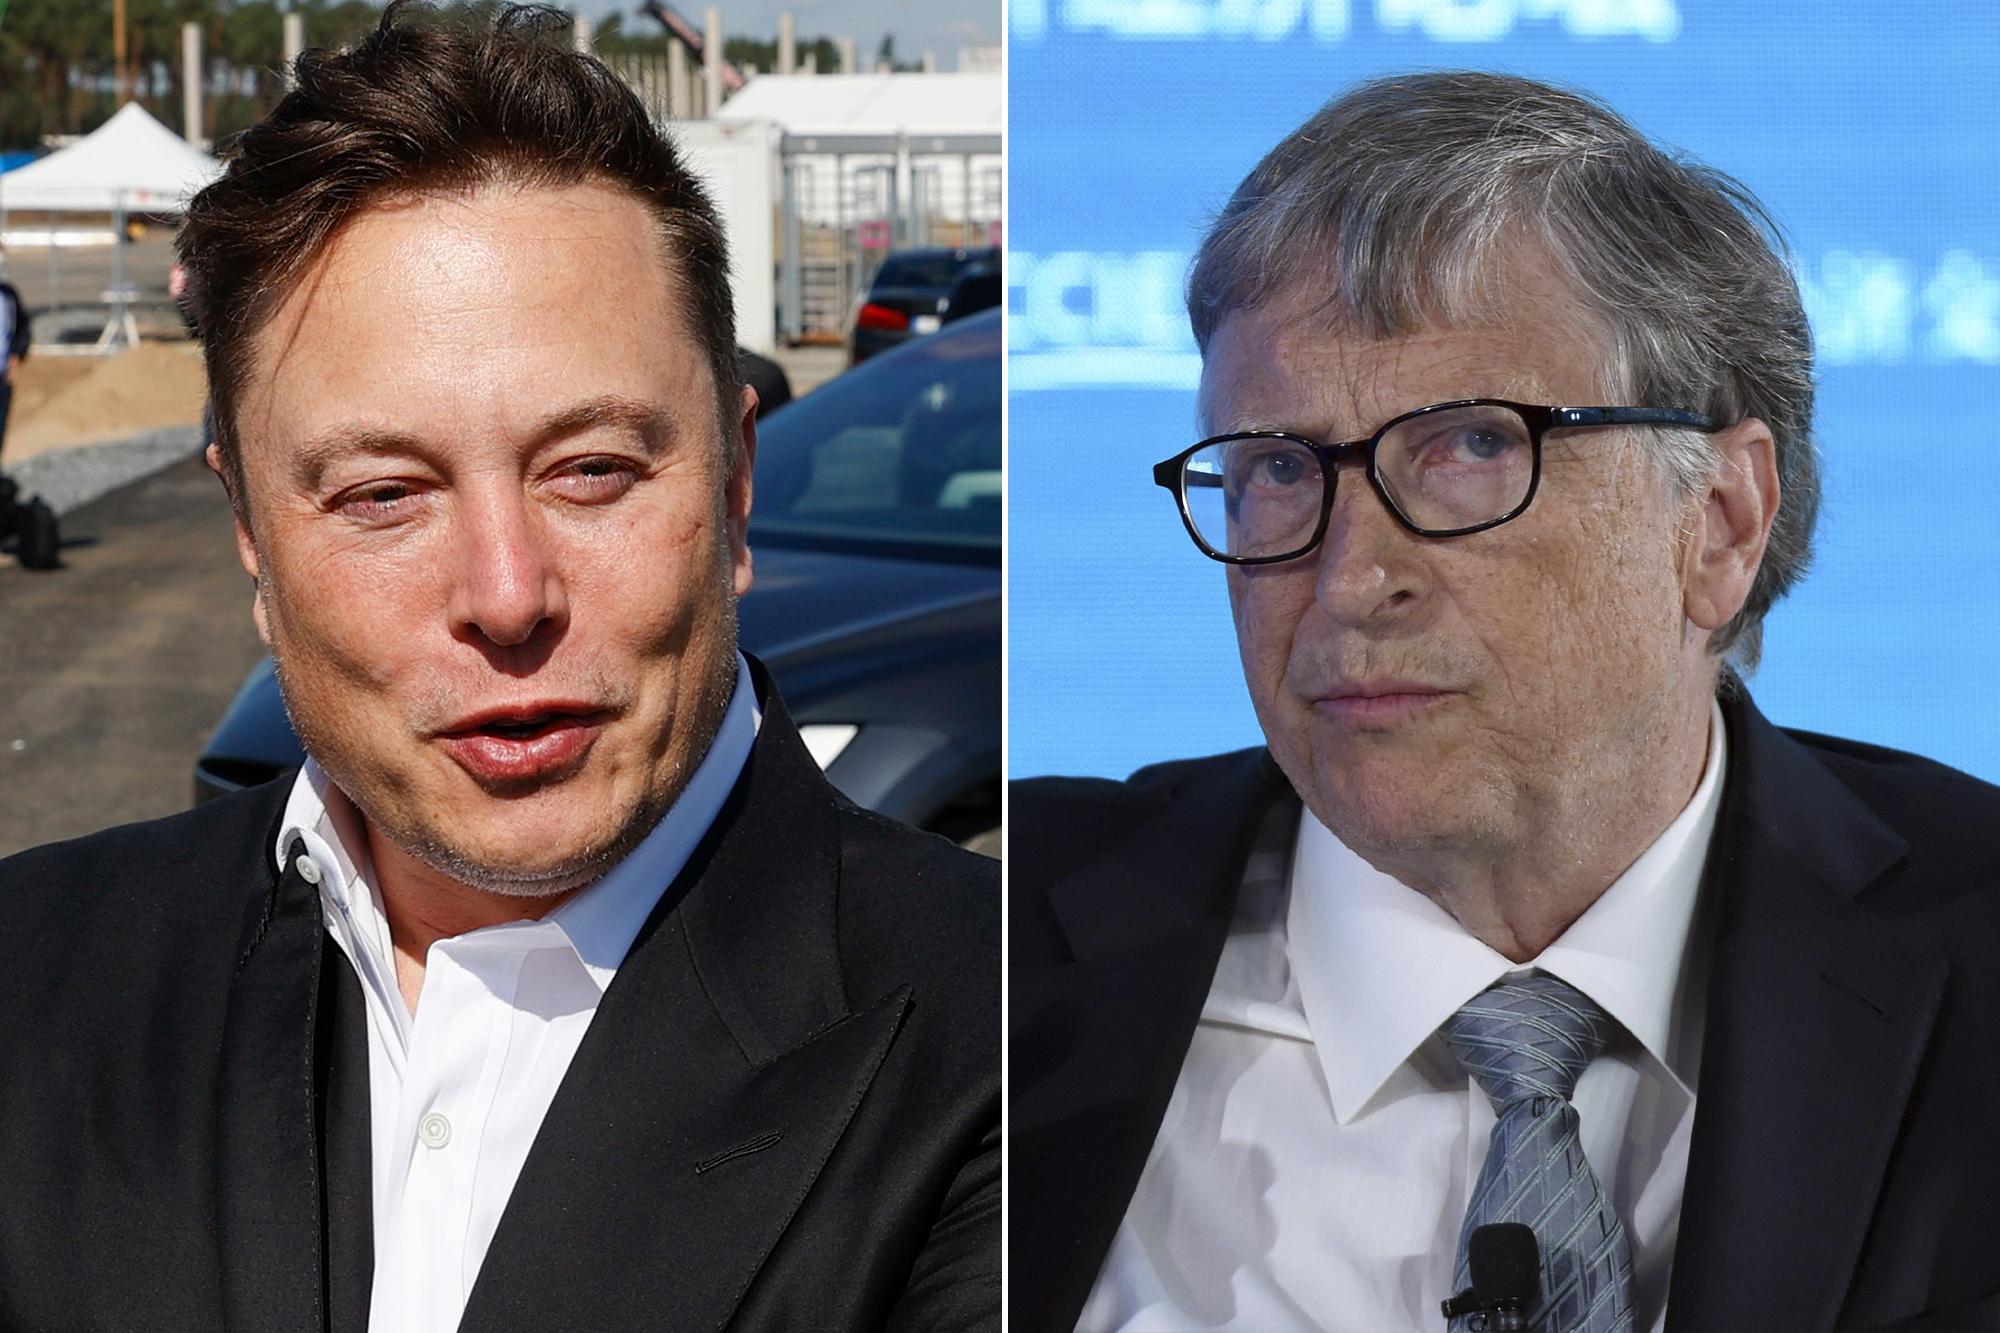 Elon Musk passes Bill Gates as world's second-richest person